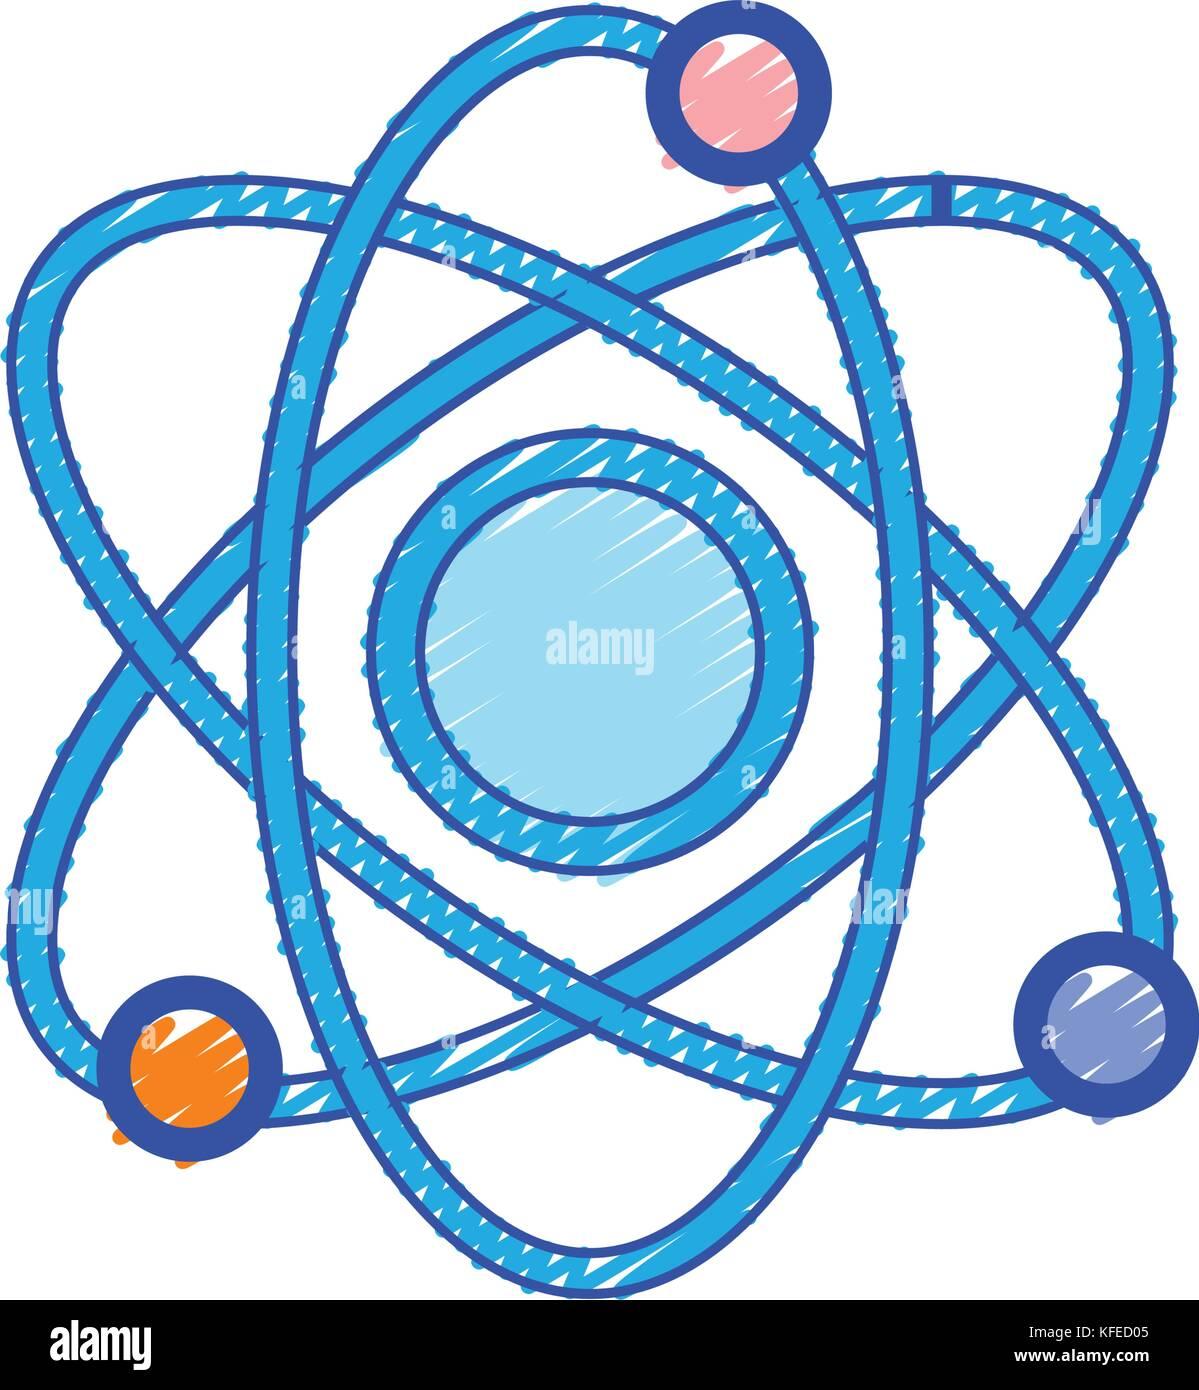 orbital diagram for beryllium 2006 nissan altima stereo wiring electron stock photos and